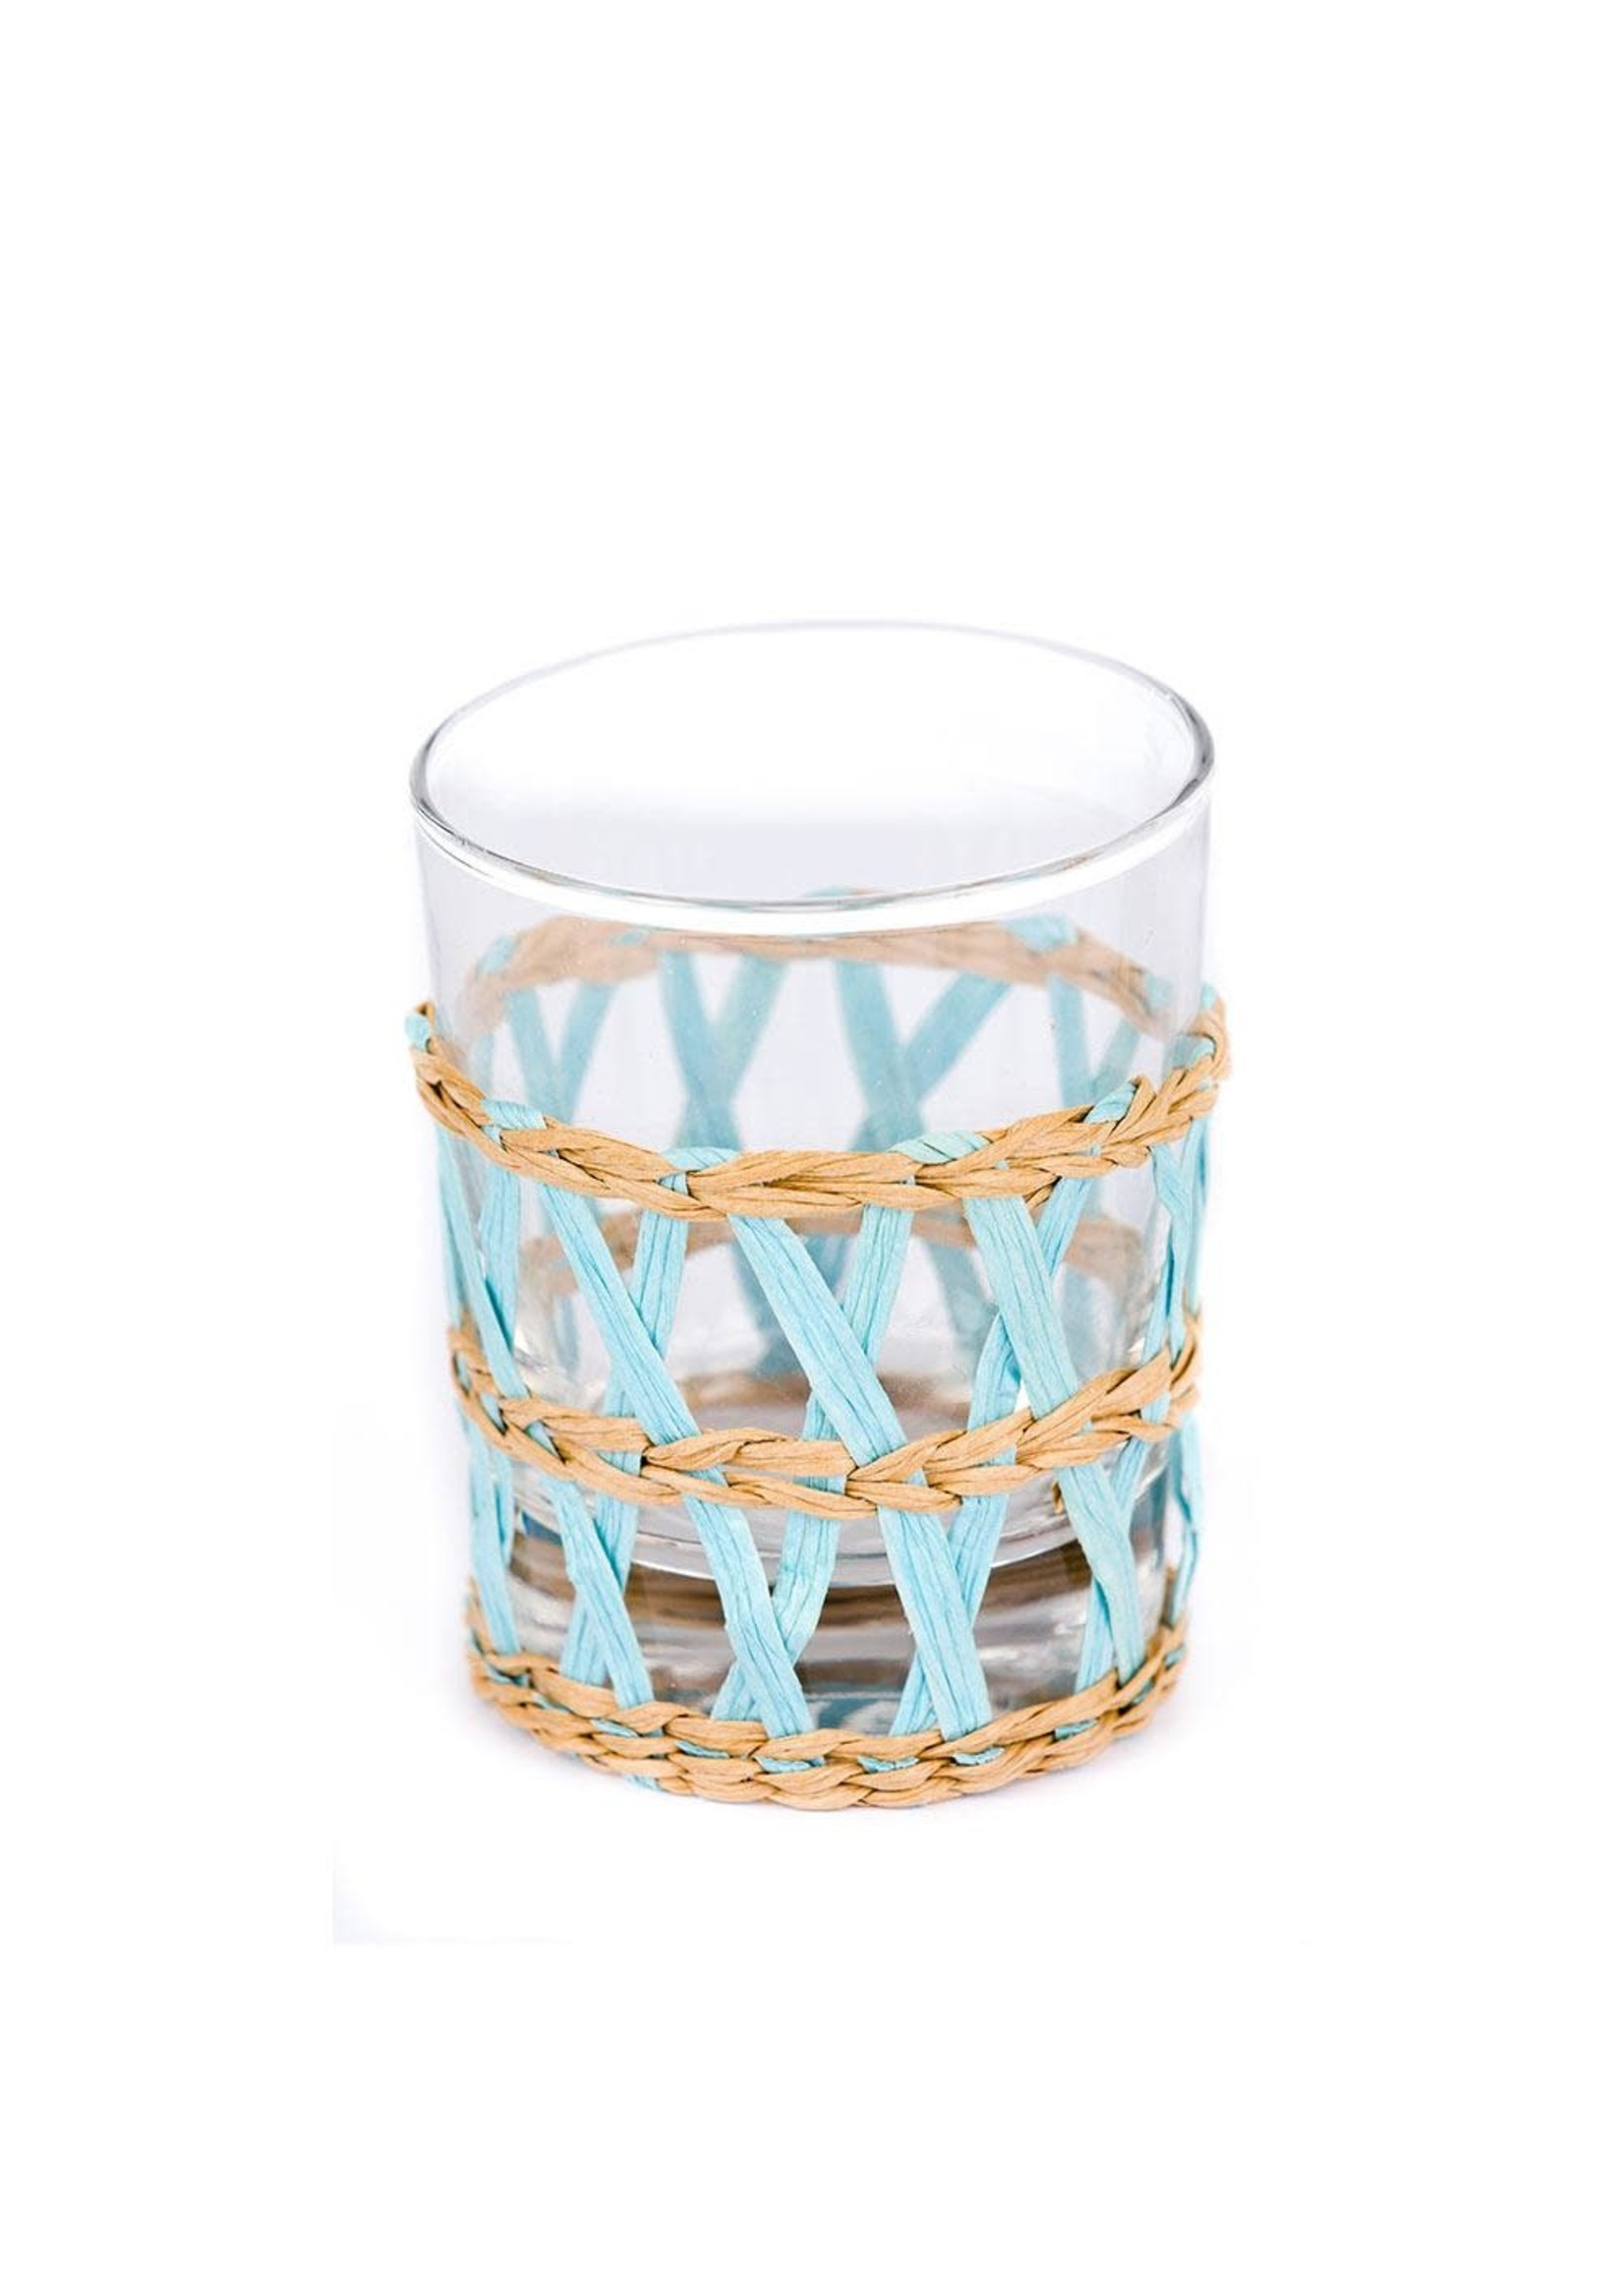 Amanda Lindroth Island Wrapped Tumbler Glass - Light Blue